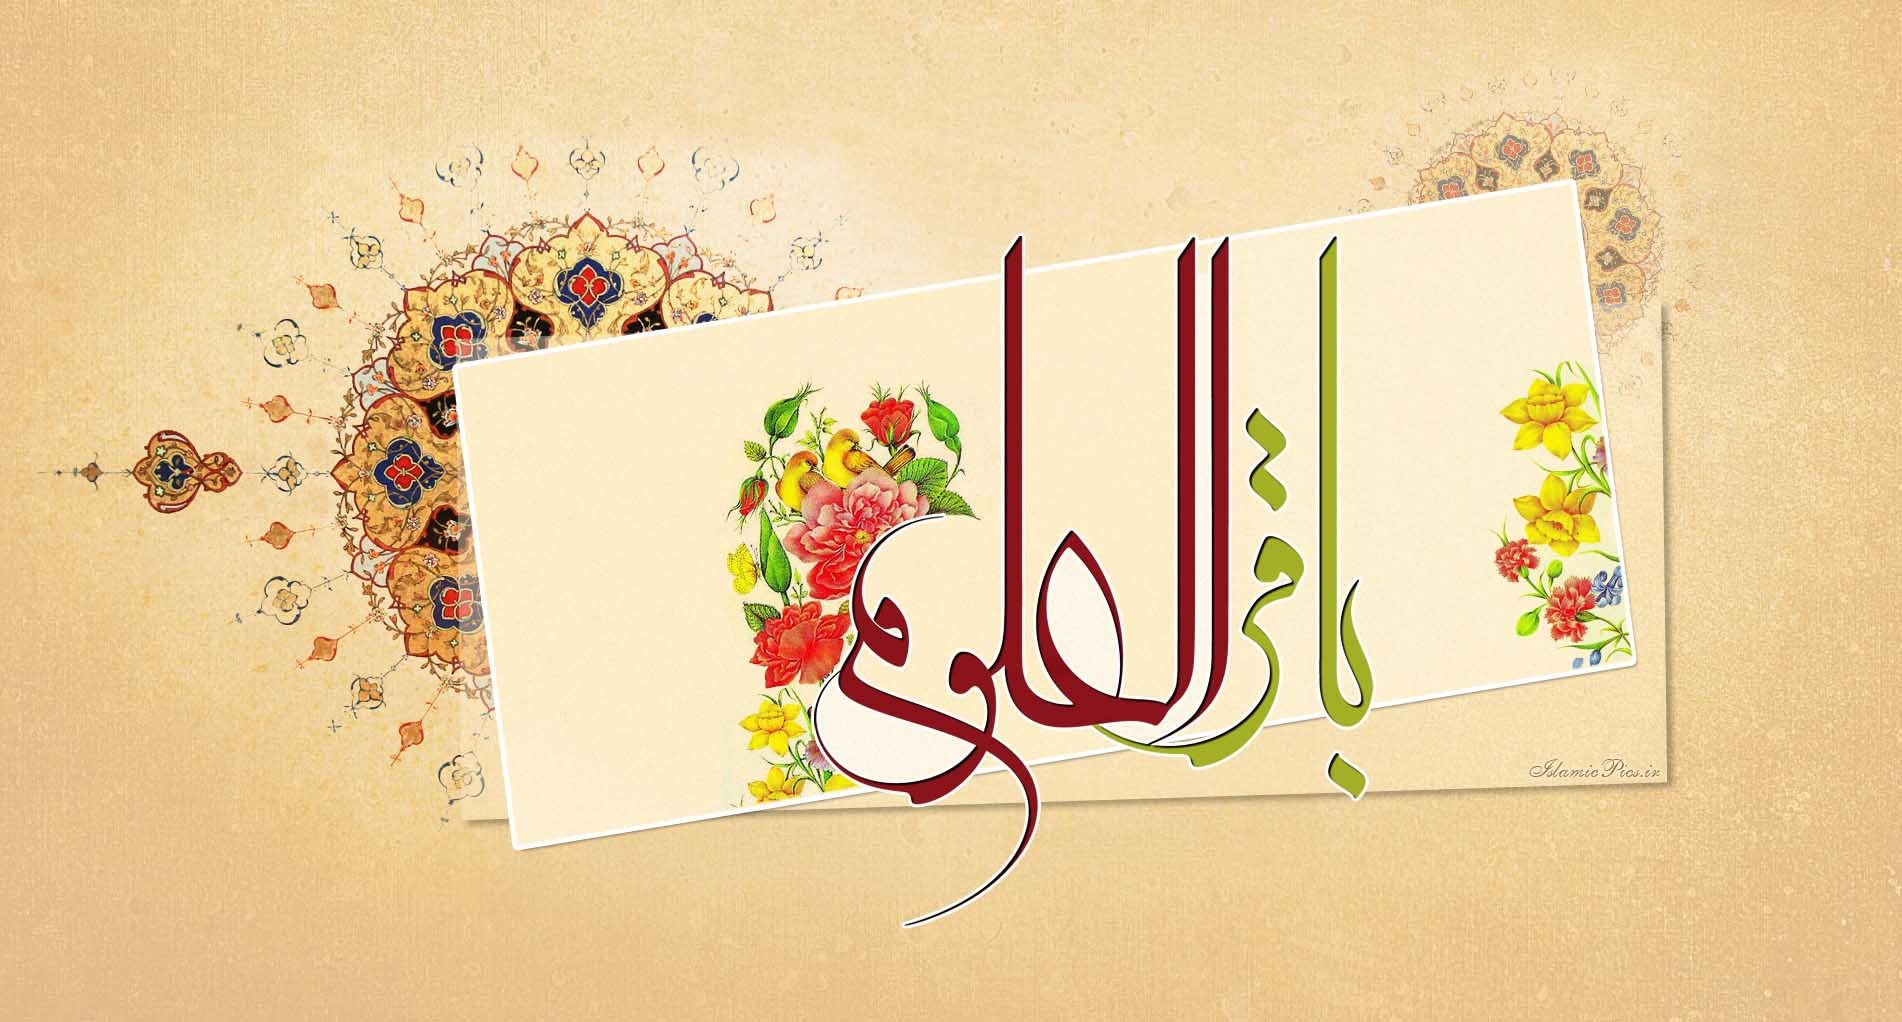 میلاد امام باقر / حسین سیب سرخی